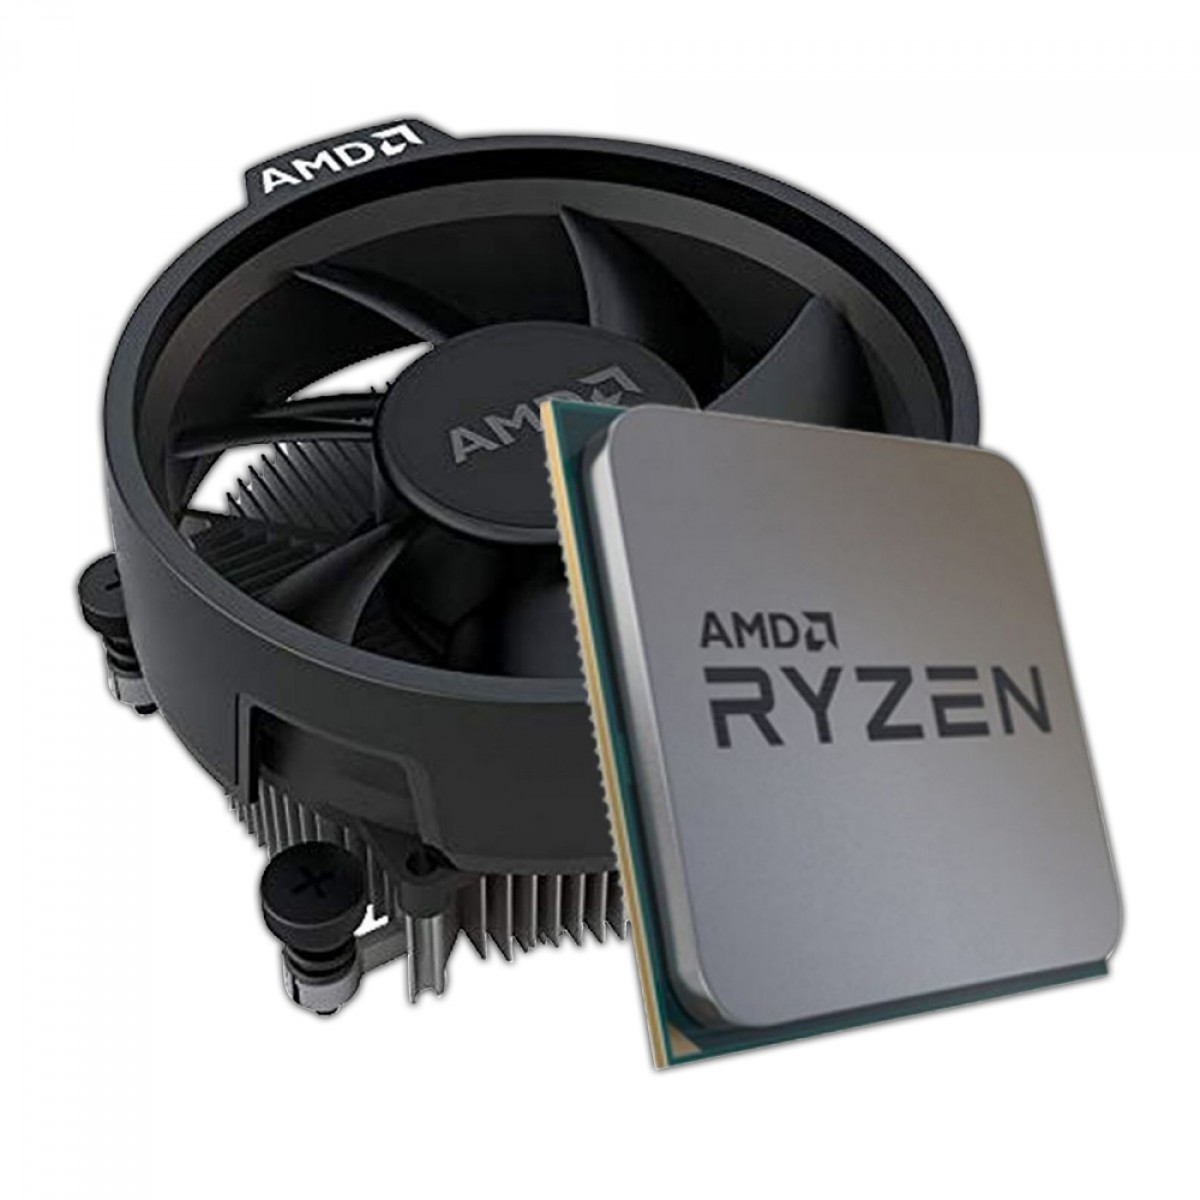 Kit Upgrade Asrock B450M Steel Legend + AMD Ryzen 3 3300X 3.8GHz + 8GB DDR4 3000MHz